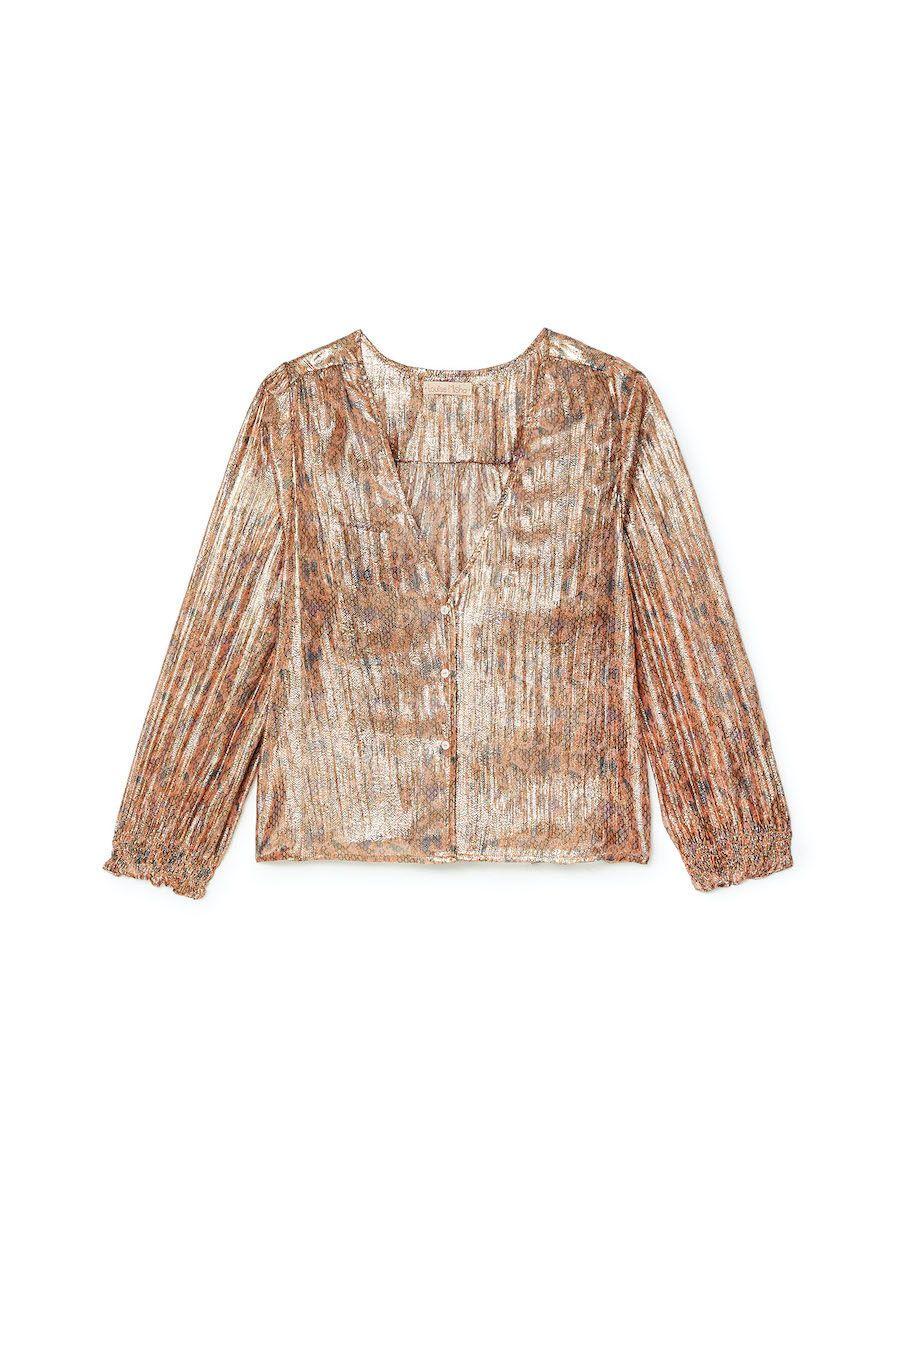 boheme chic vintage blouse femme laurie sienna polka dots